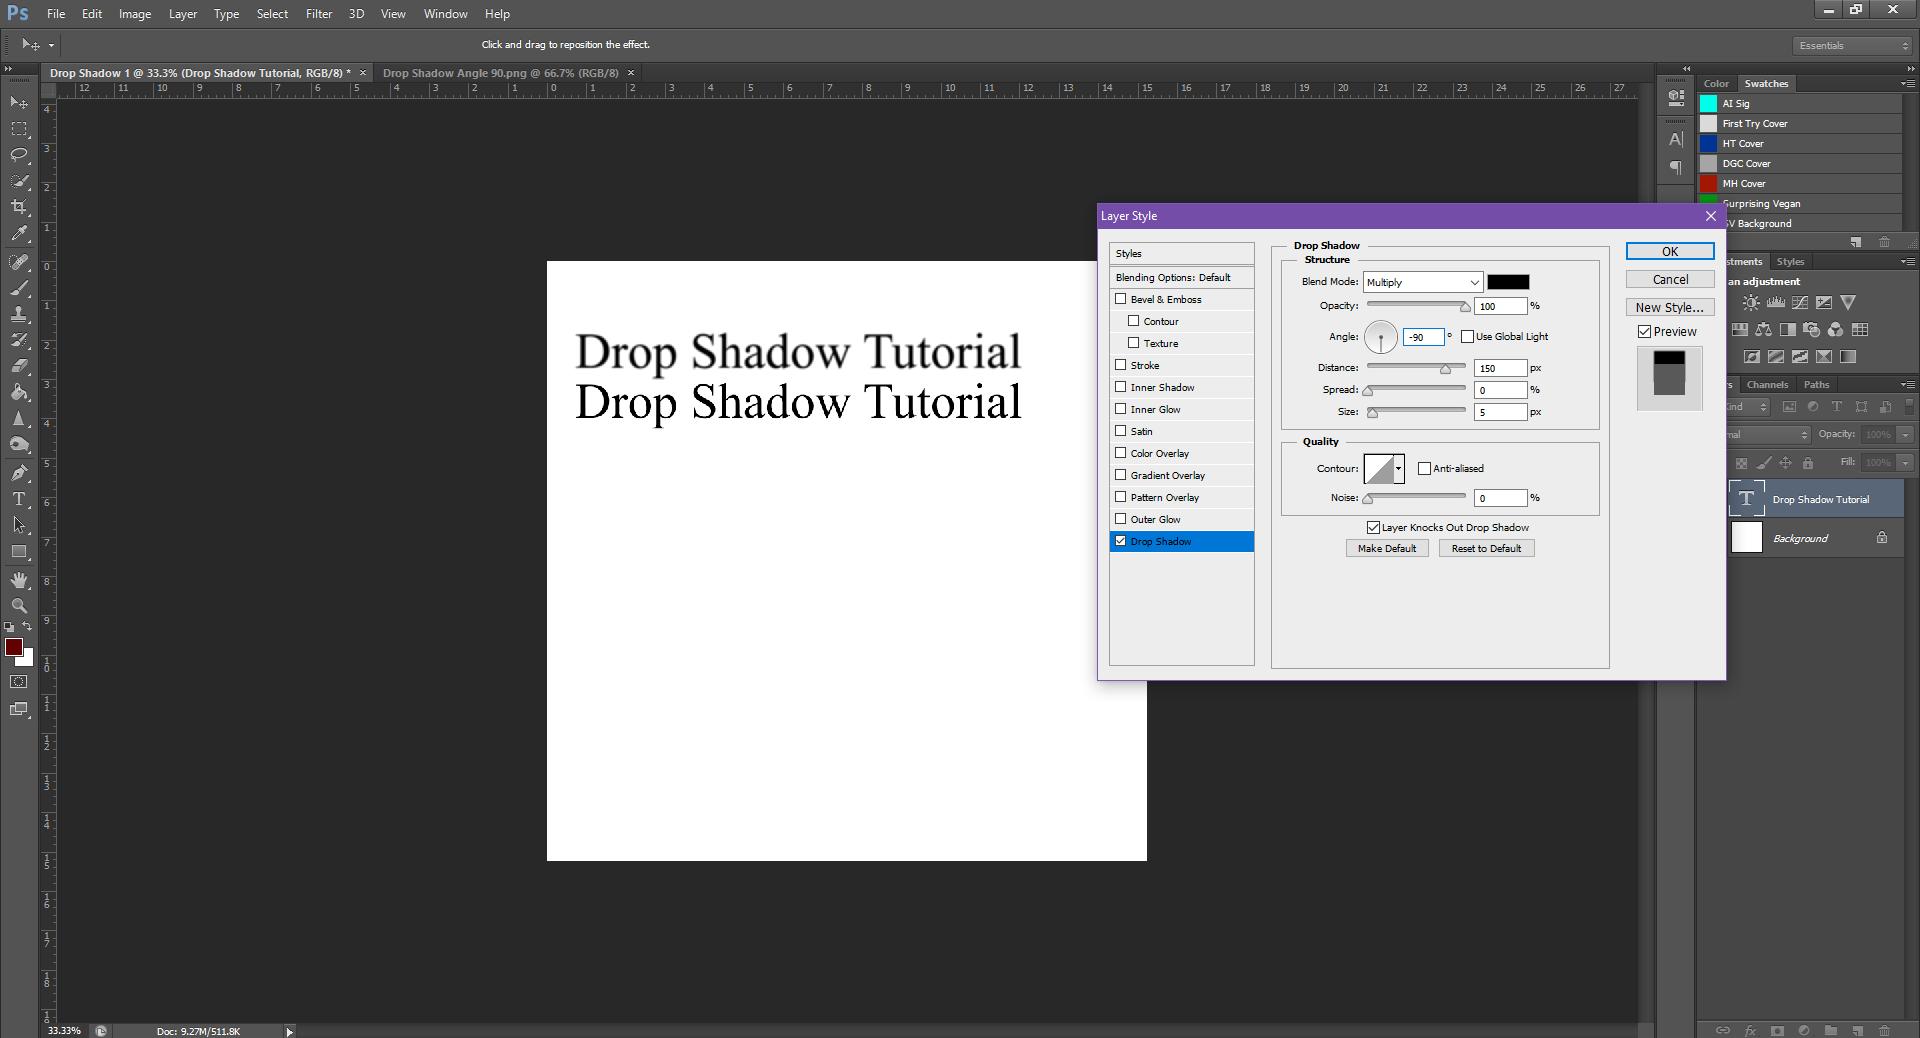 AterImber.com - Writing - Writing Tips - PHSH Tutorial - Drop Shadow - Angle -90